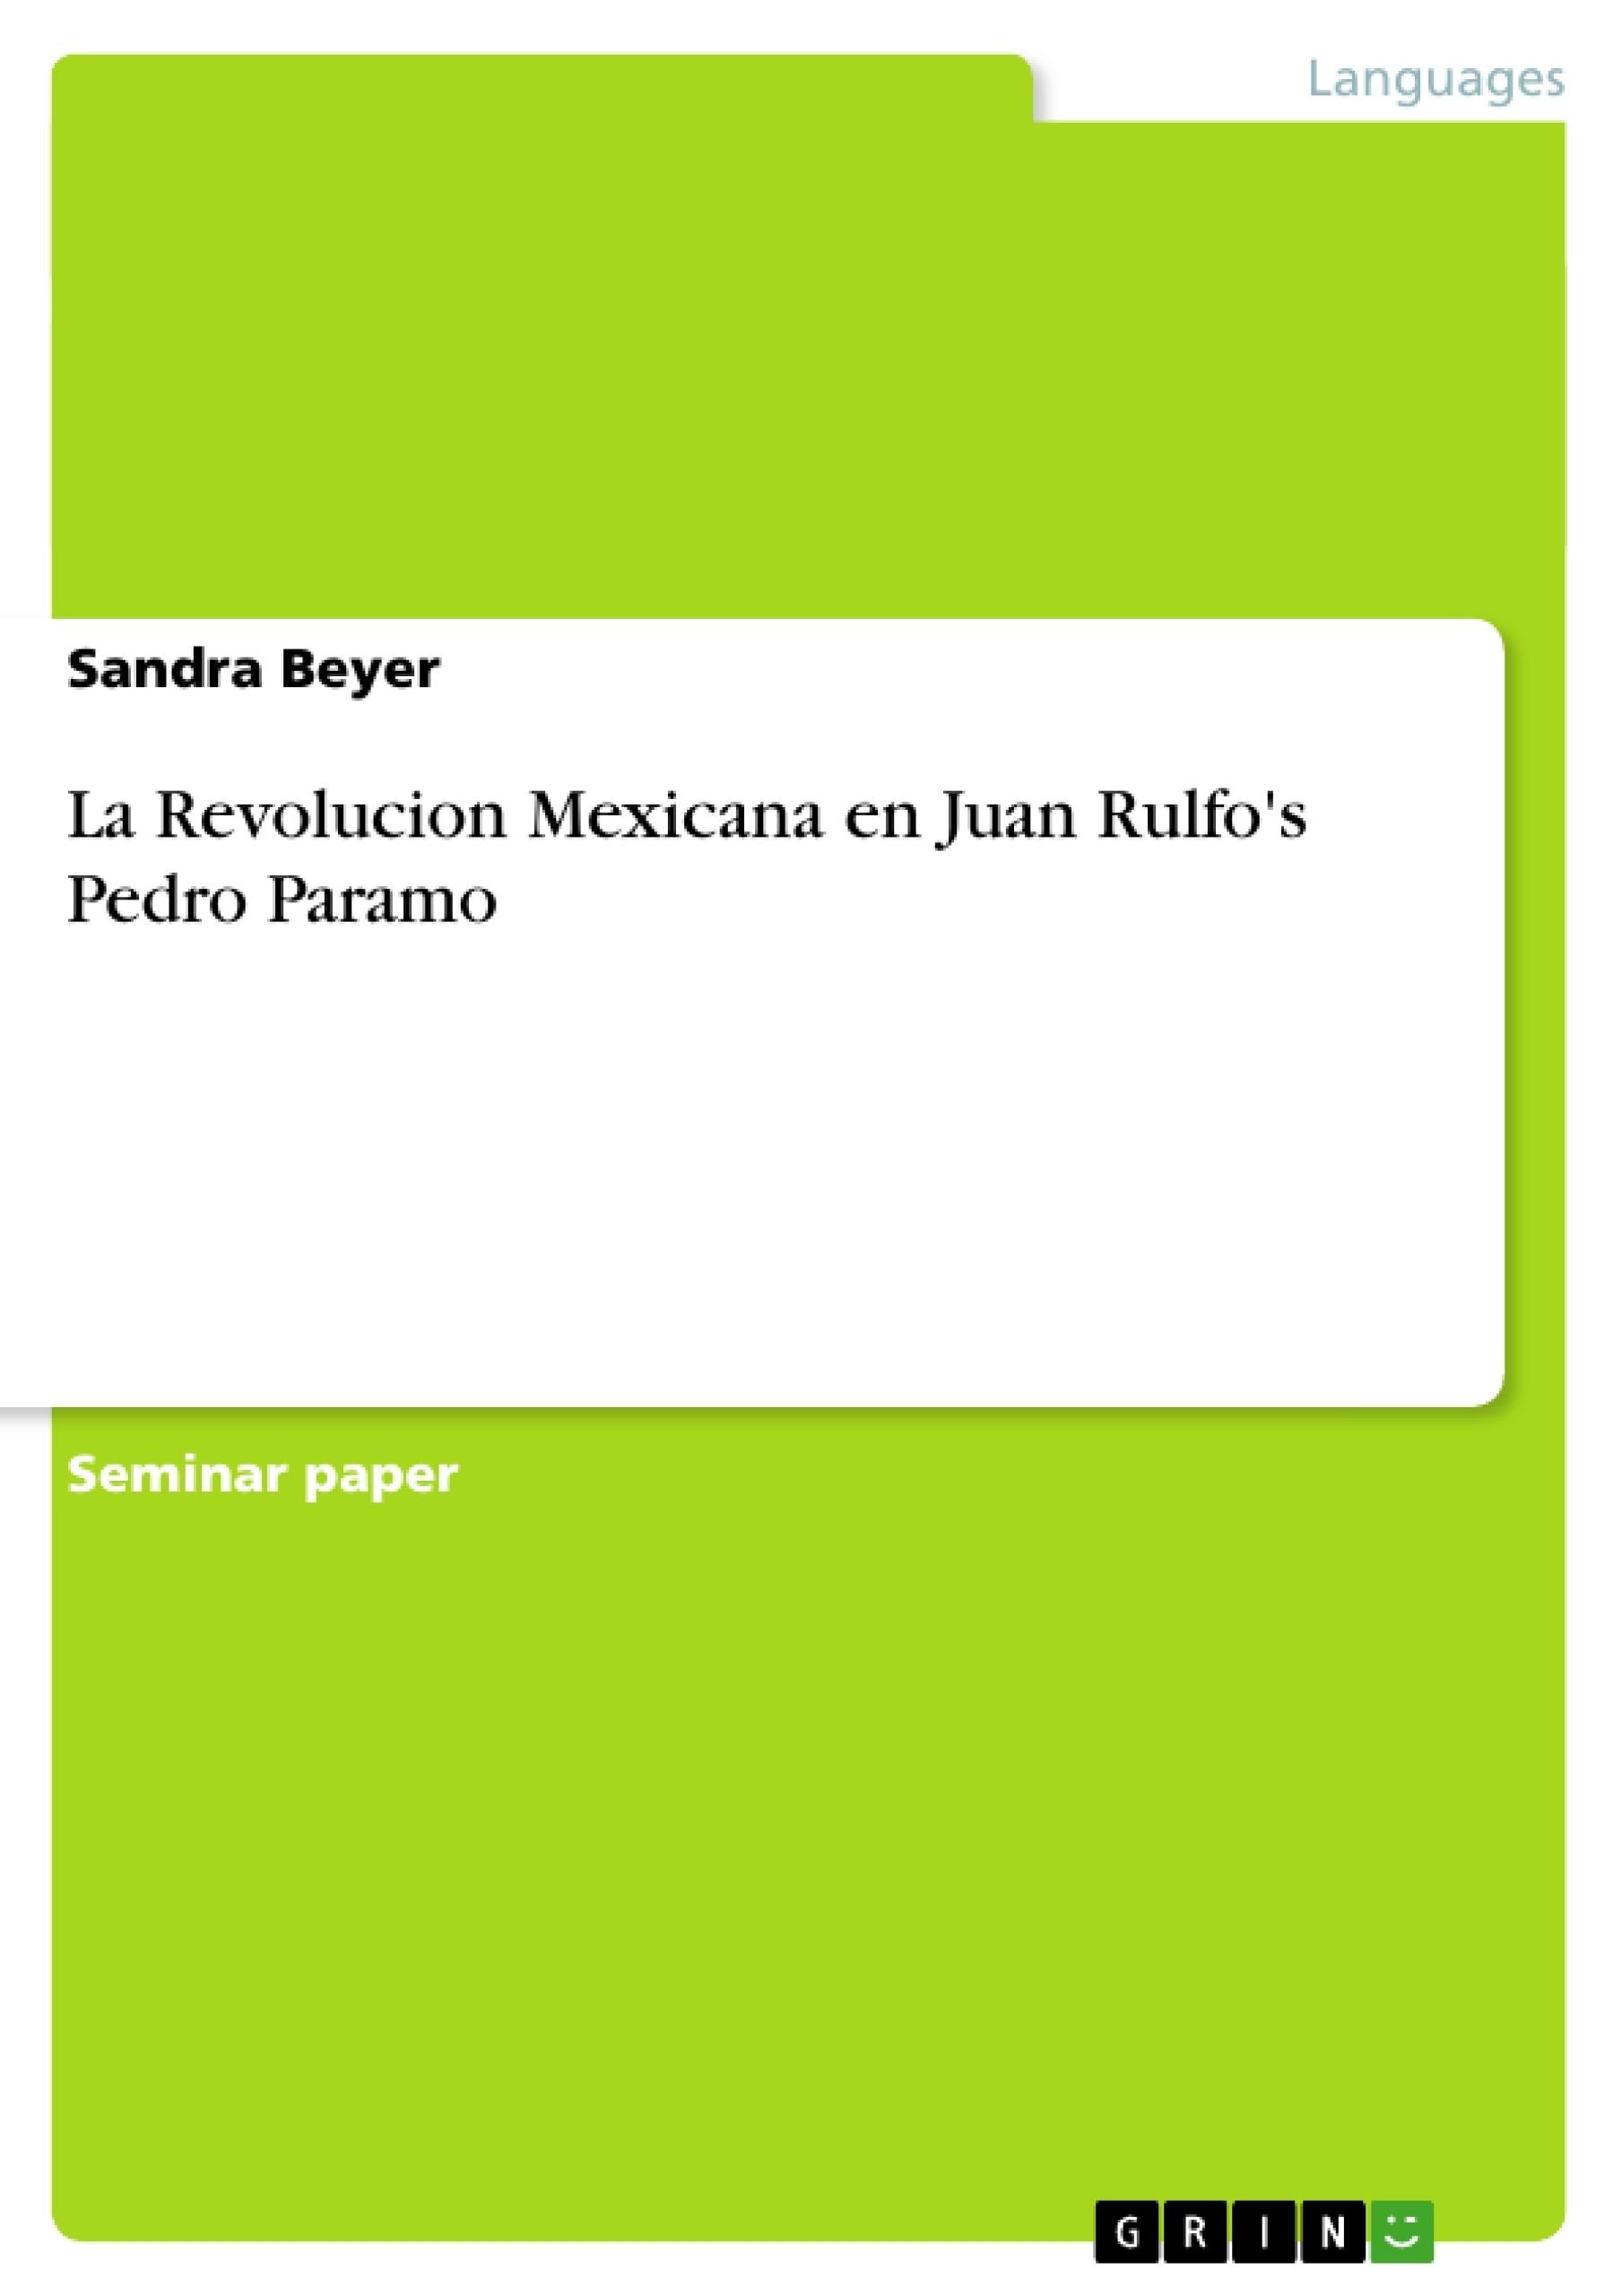 Título: La Revolucion Mexicana en Juan Rulfo's Pedro Paramo